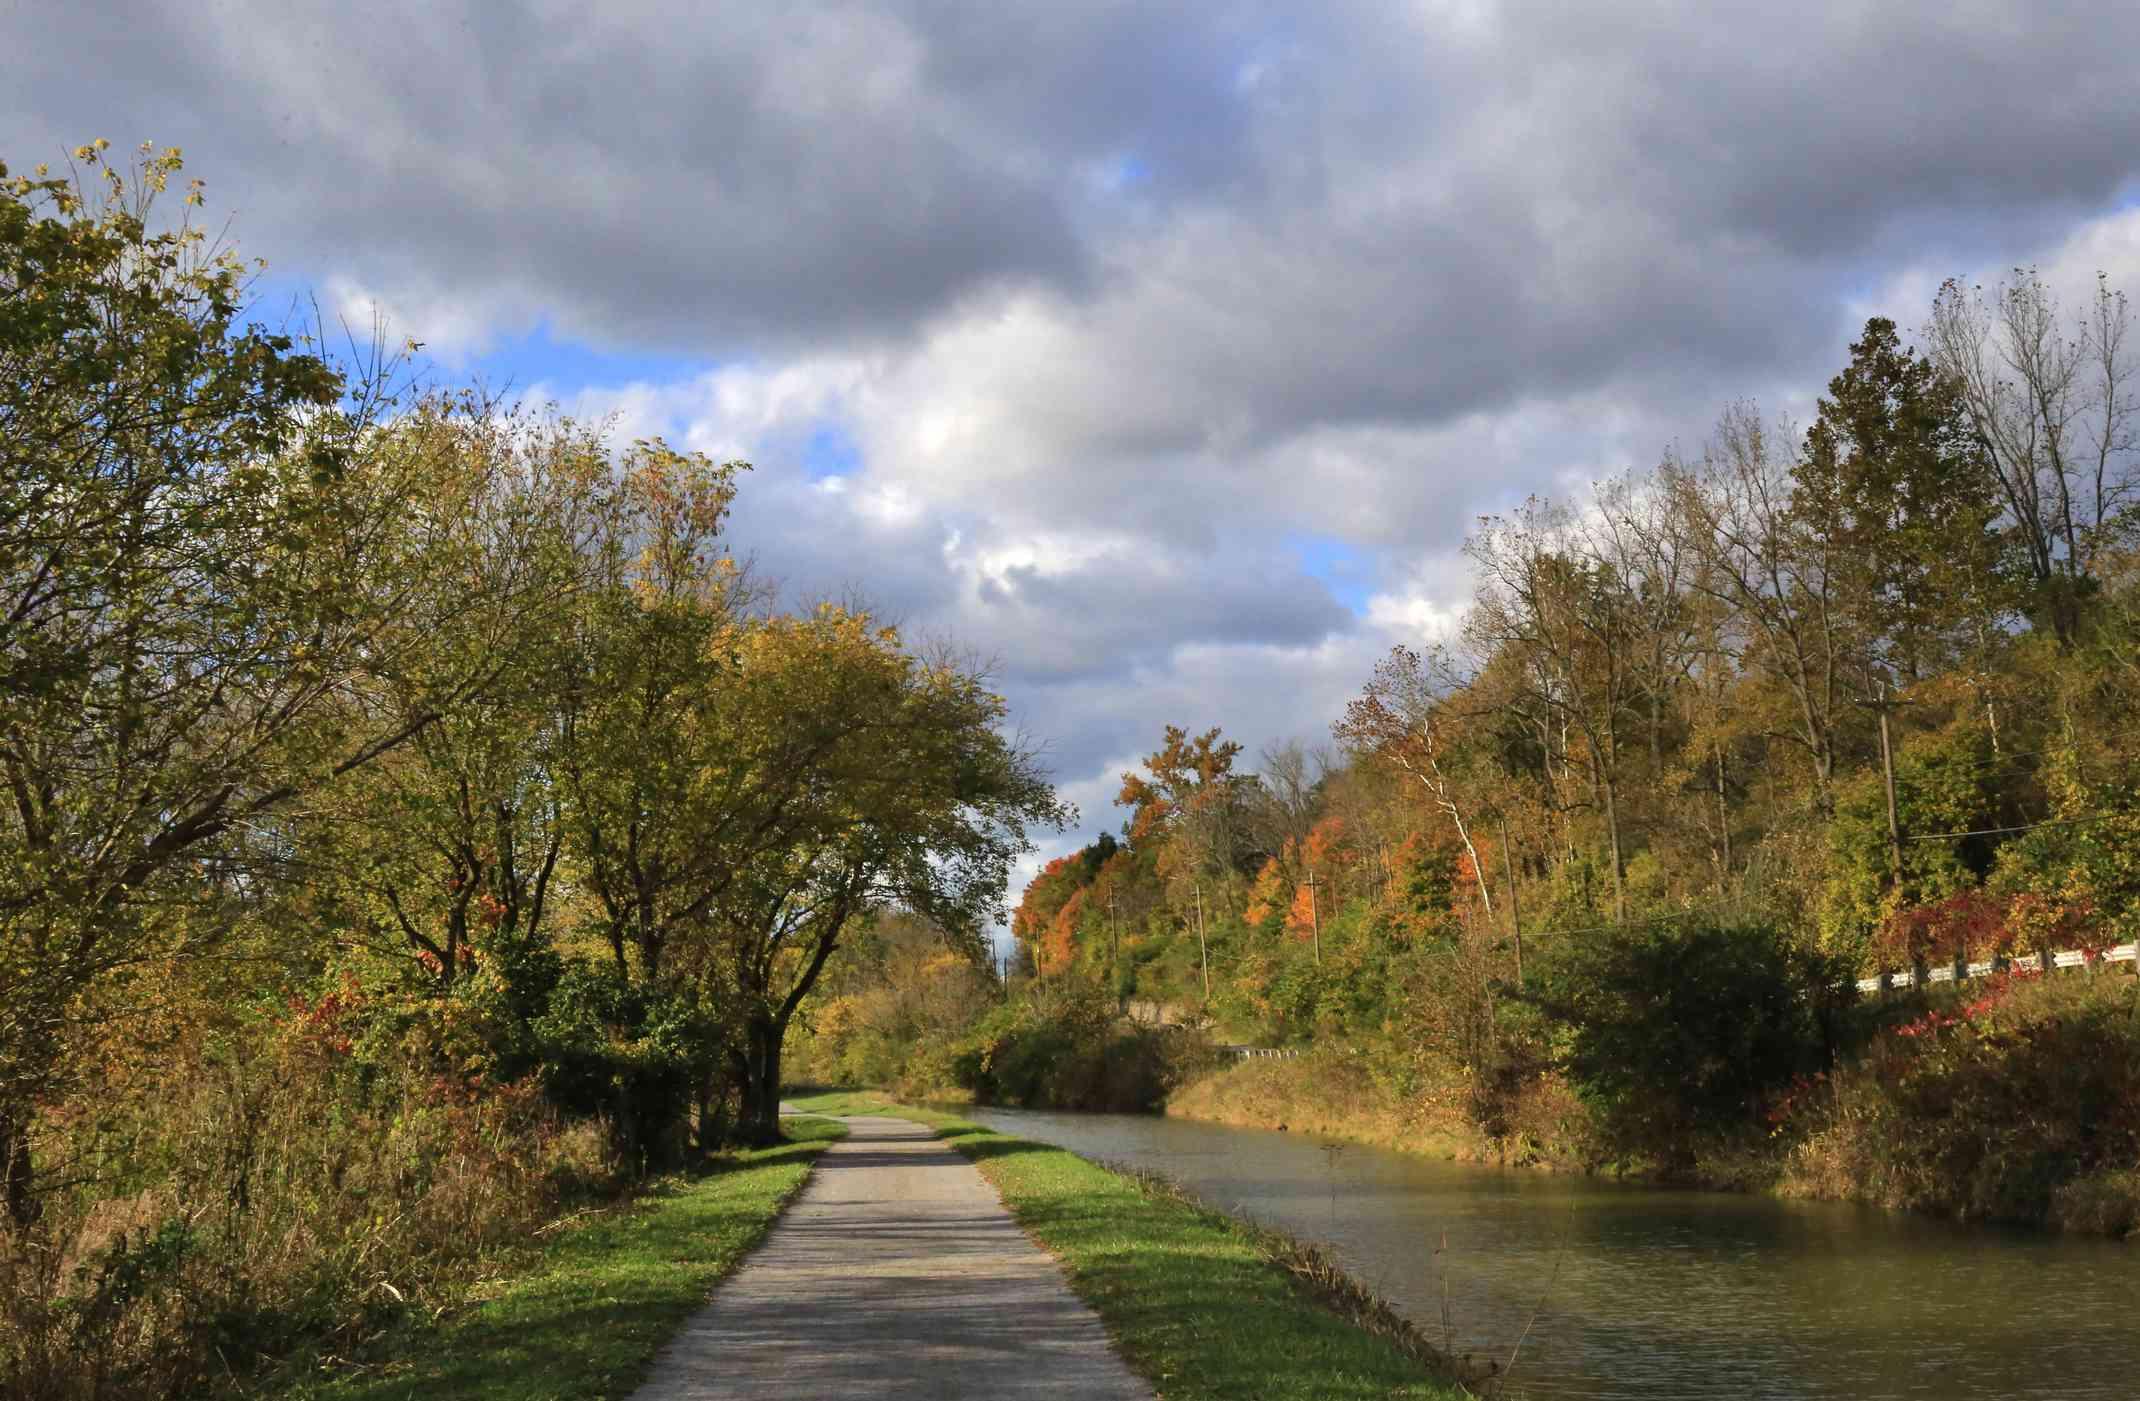 A bike path along a canal in a woodland landscape